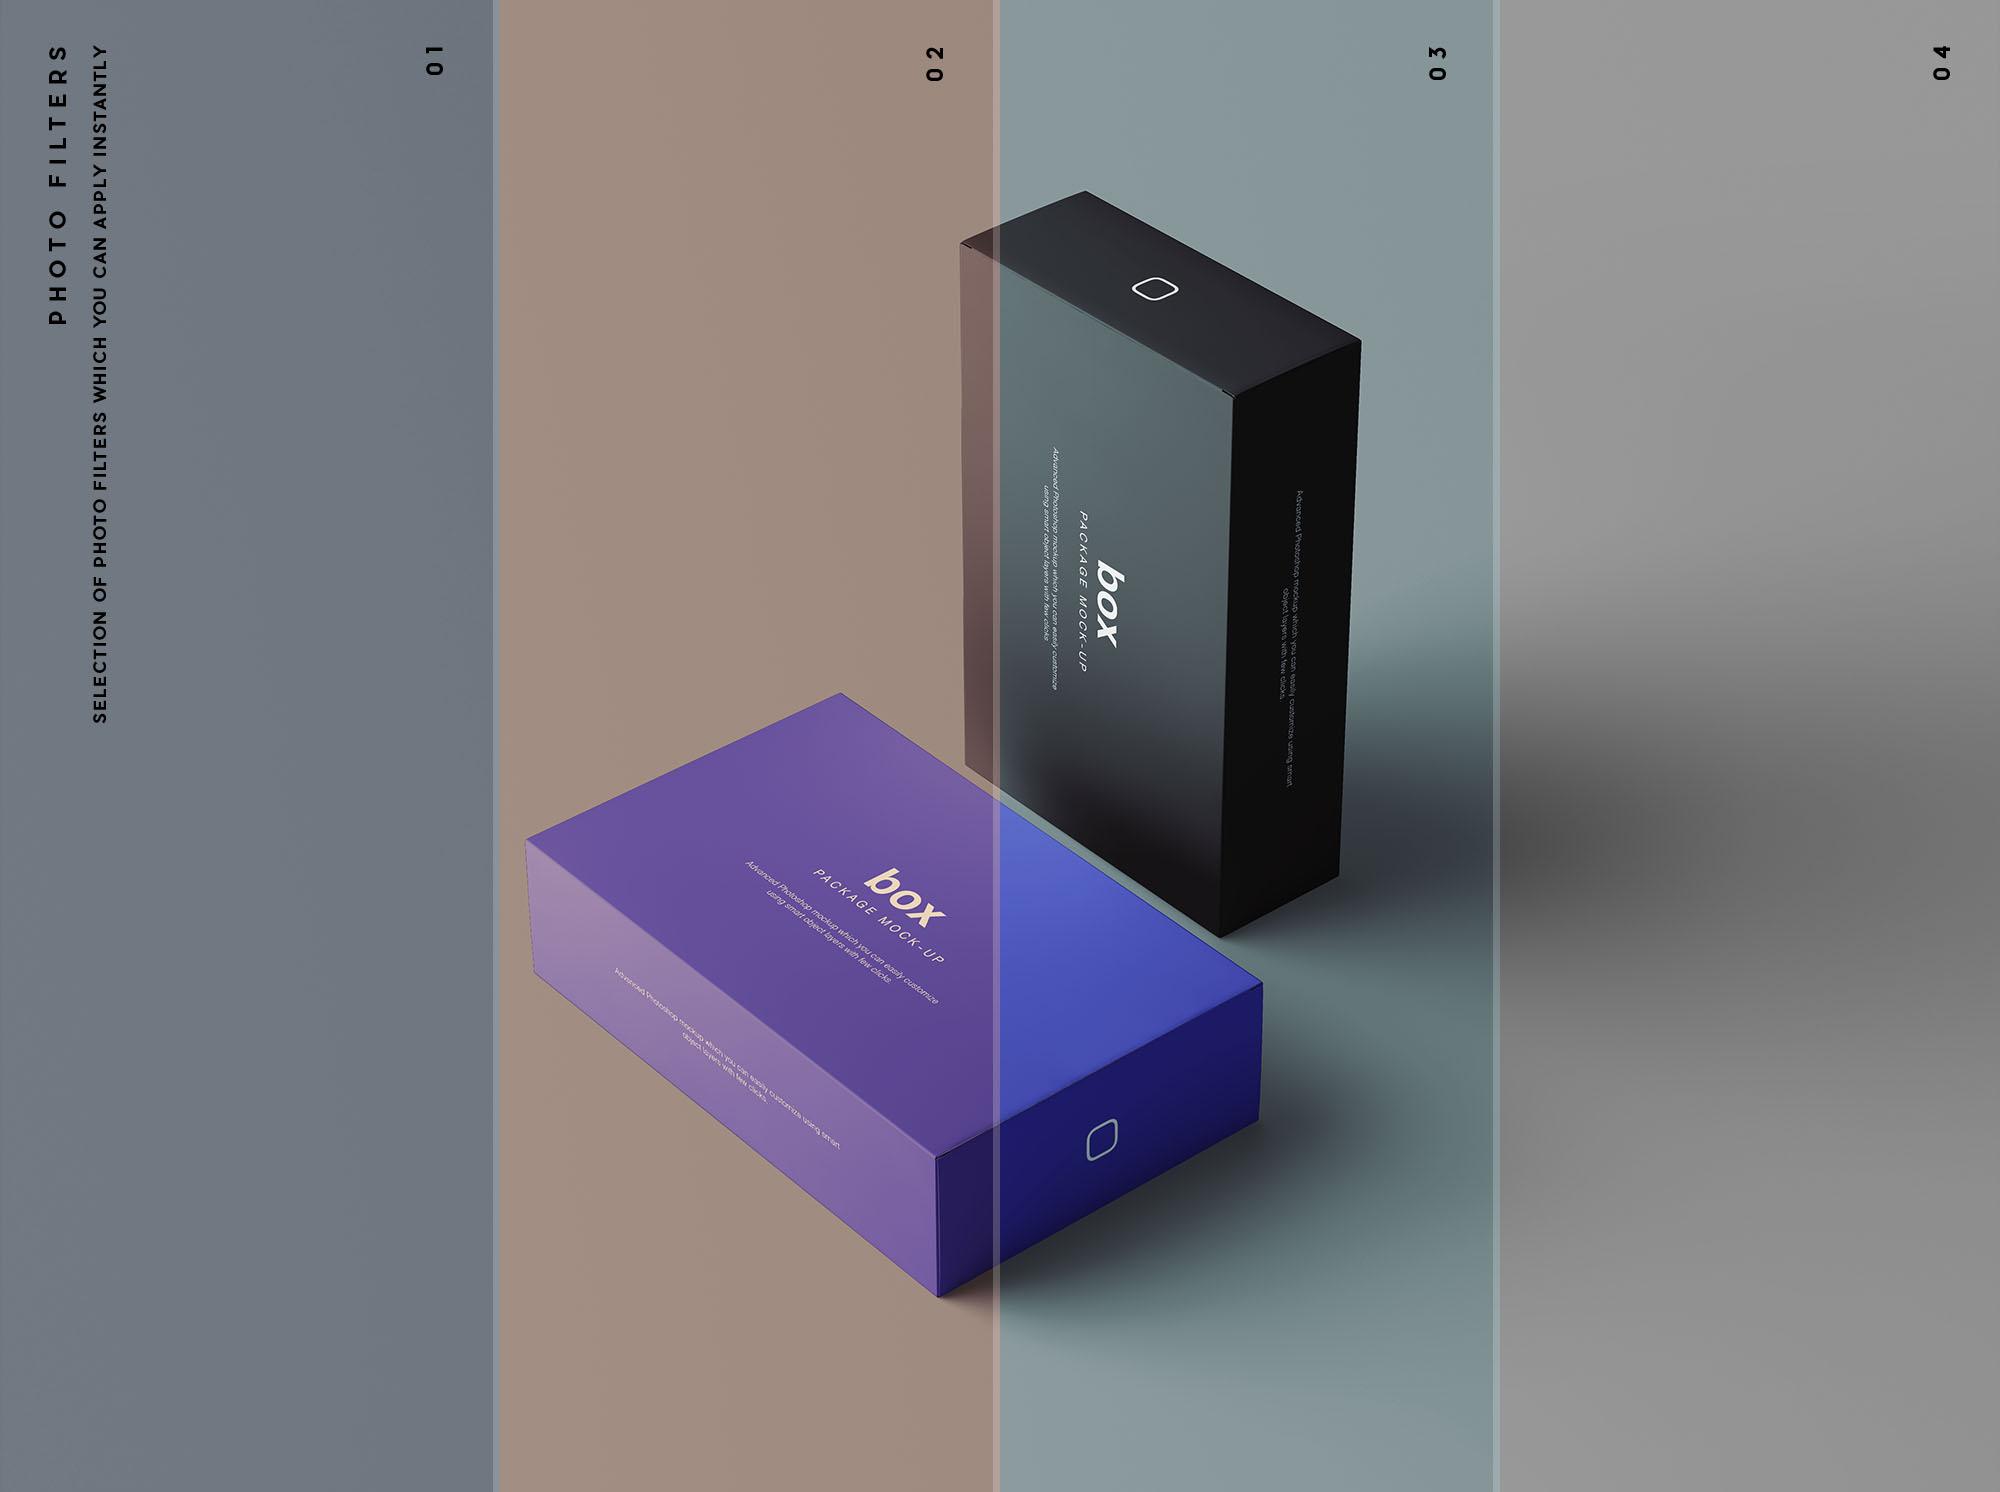 Branding-Mockup-Blank-Mode.jpg